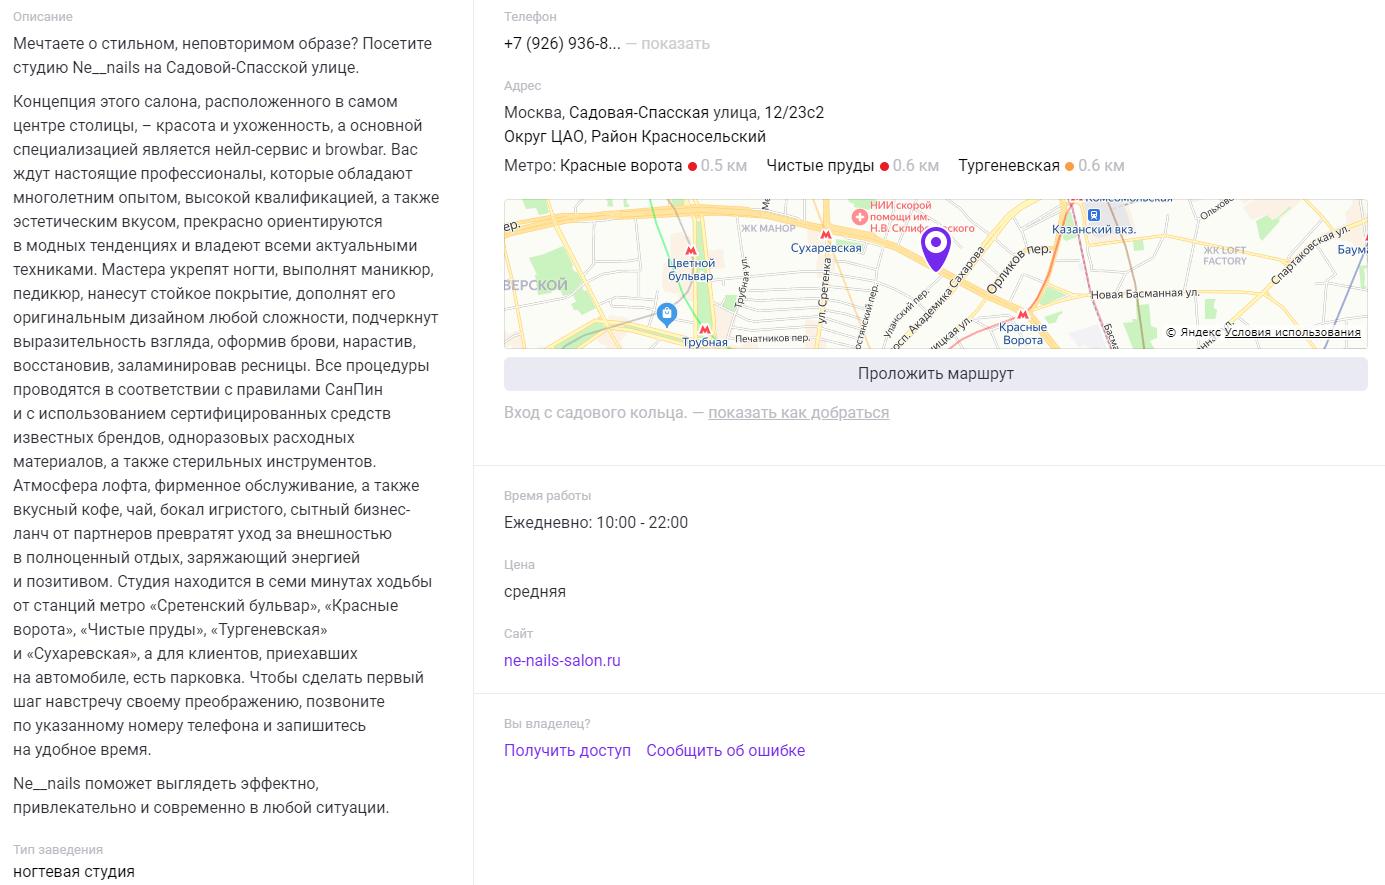 скриншот, zoon основная информация о салоне